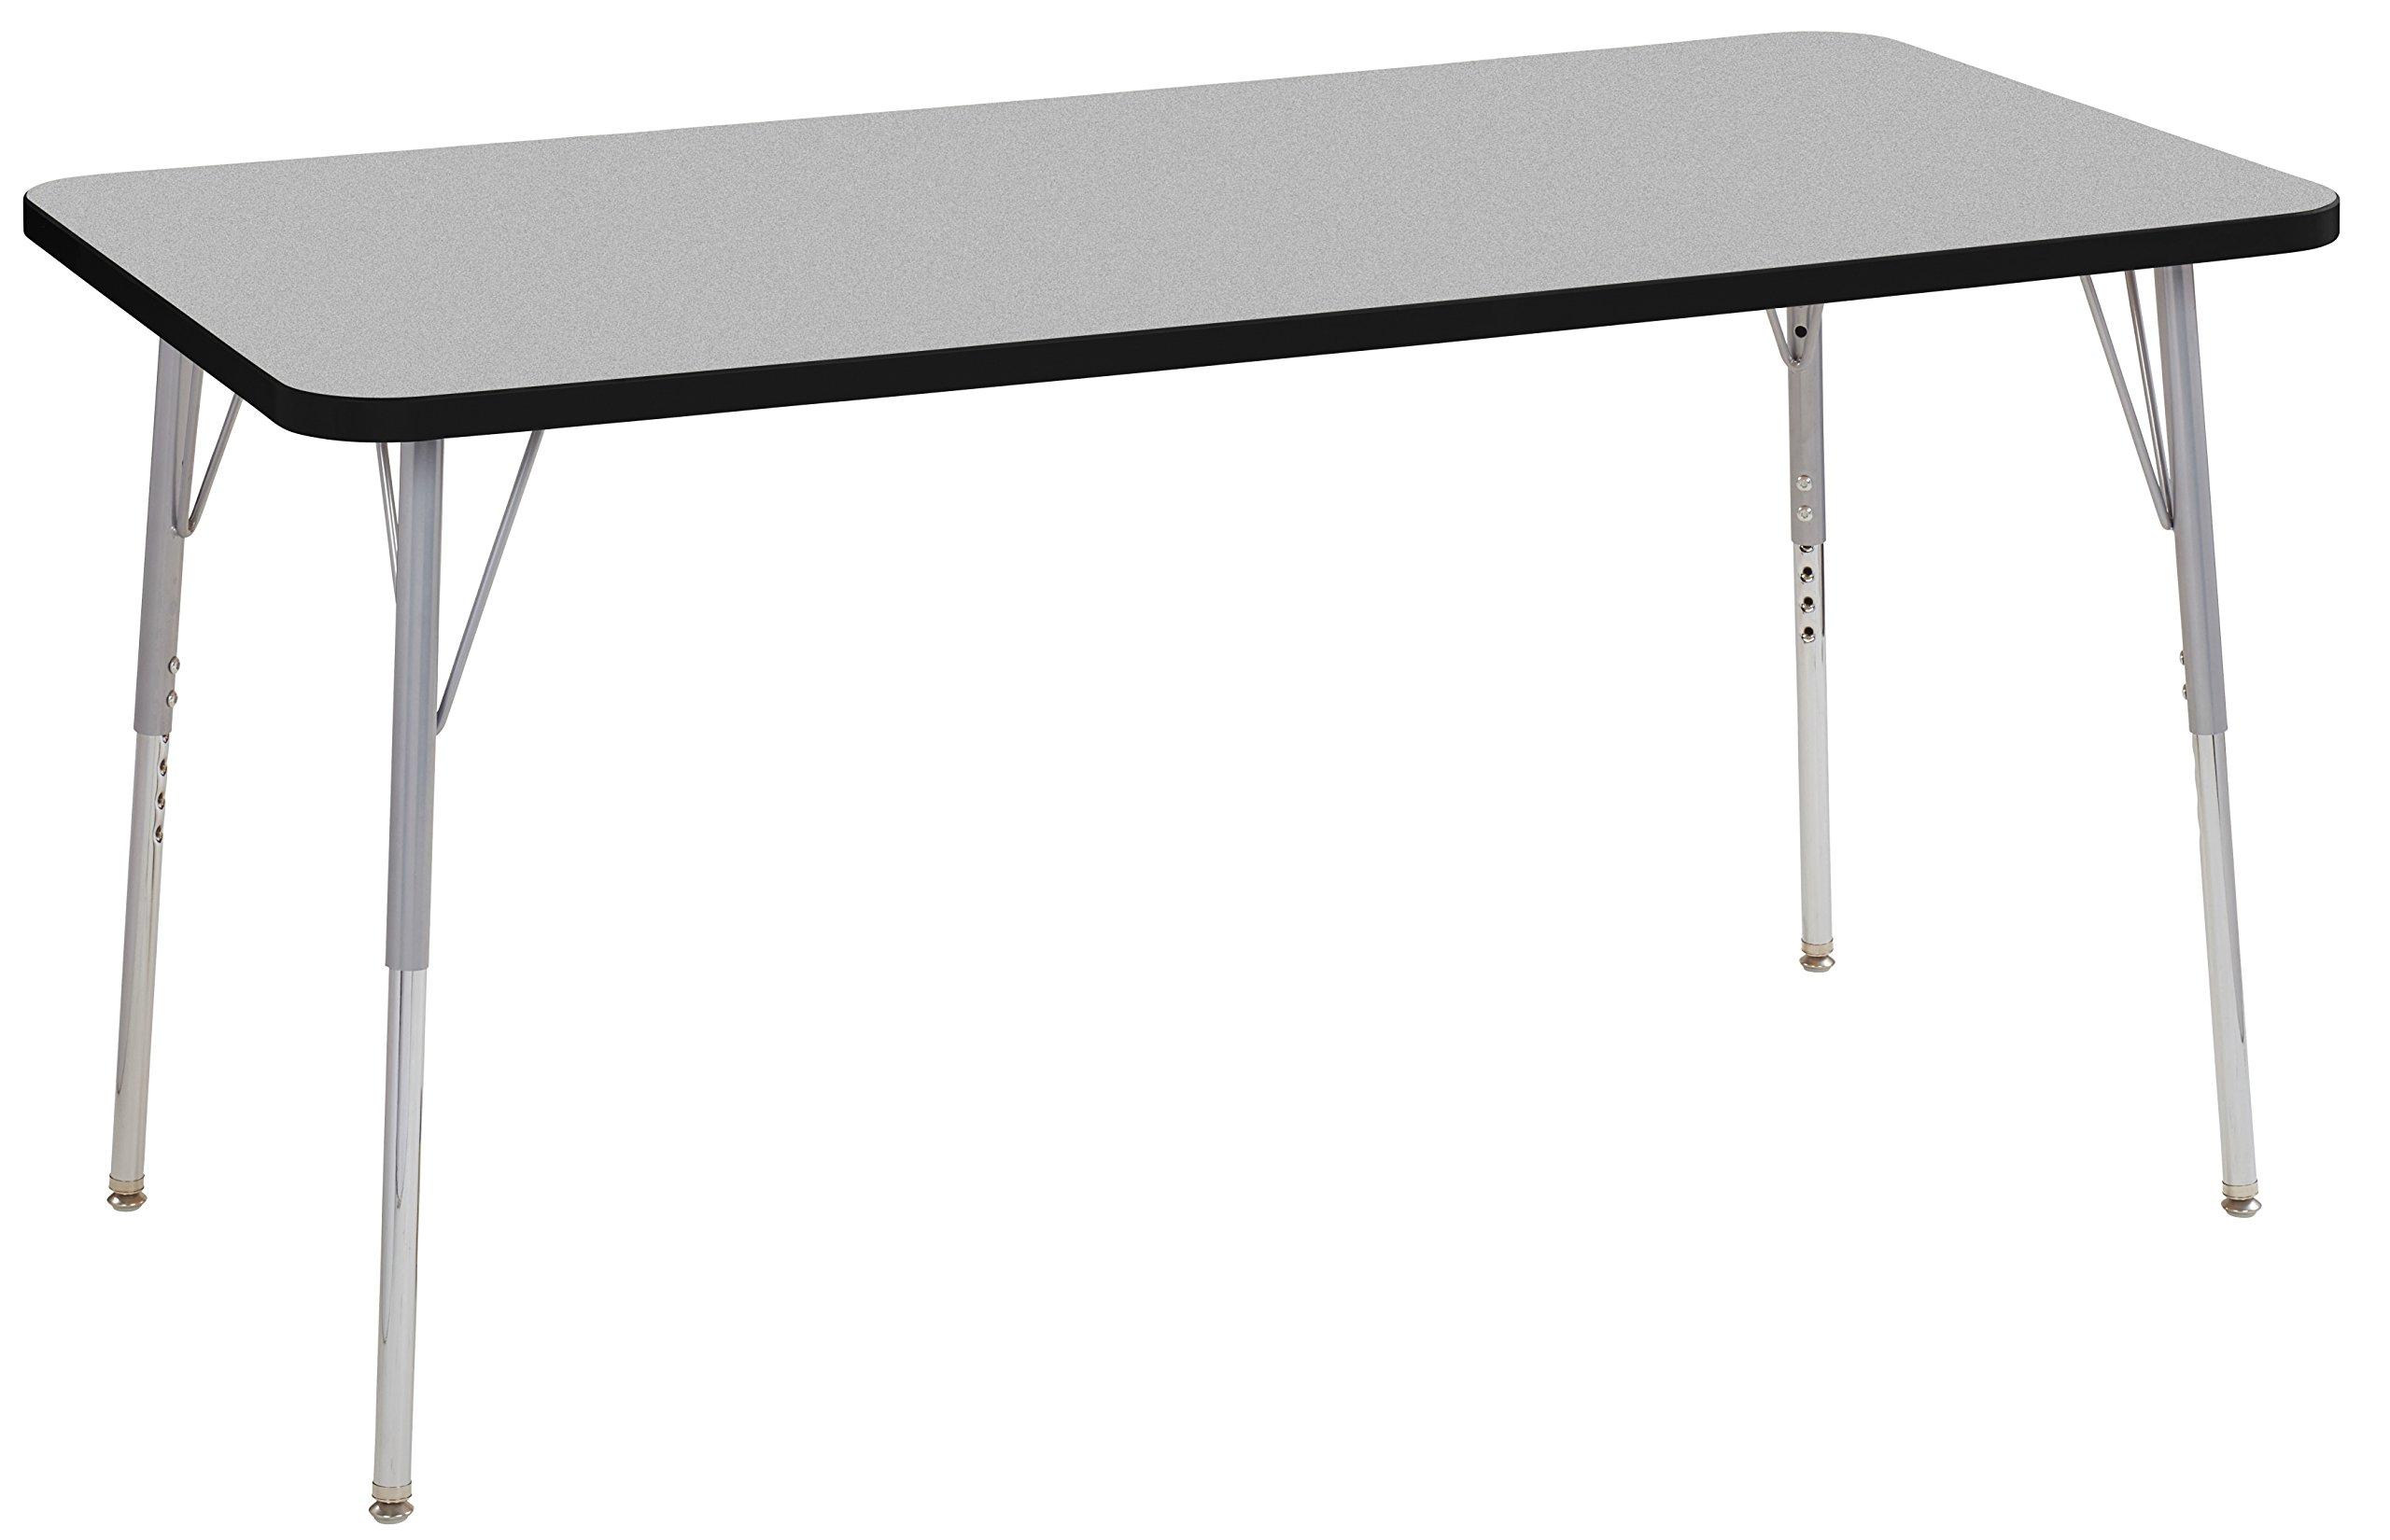 ECR4Kids Contour 30'' x 60'' Rectangle Activity School Table, Standard Legs w/ Swivel Glides, Adjustable Height 19-30 inch (Grey/Black)